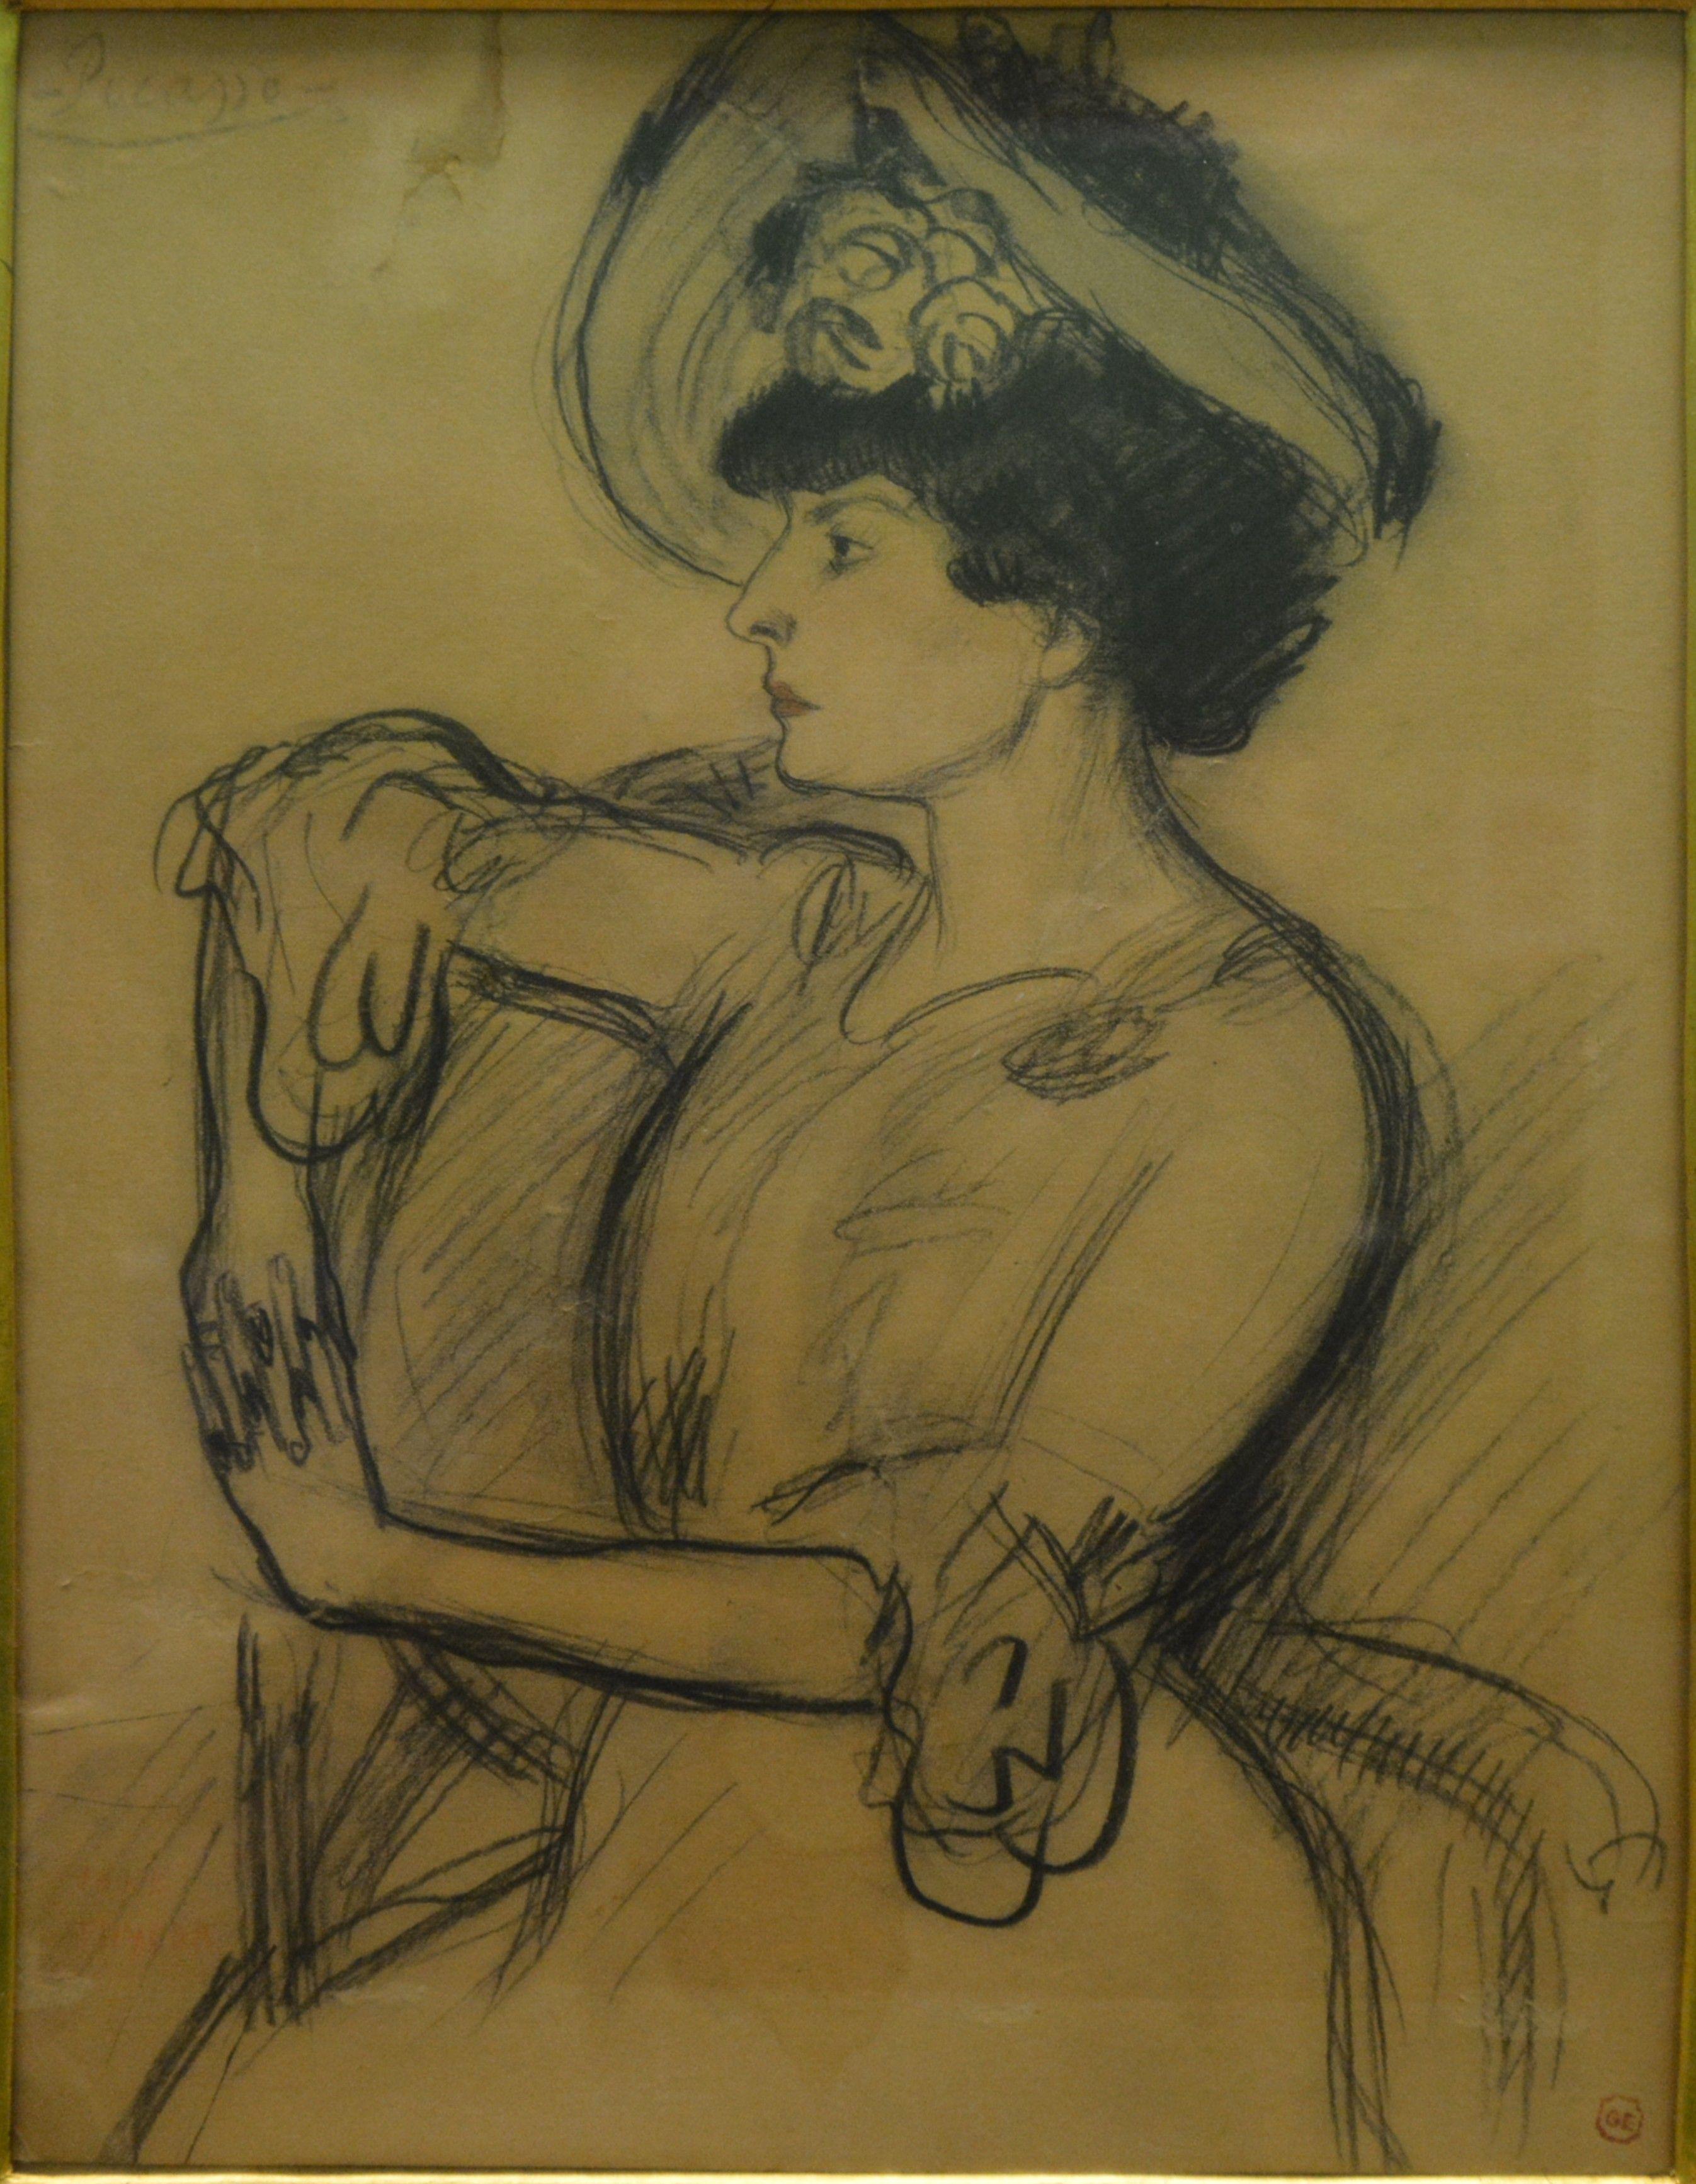 1905 Portrait De Jane Thylda Fondation Bemberg Toulouse 27 Mai 2017 Dessin